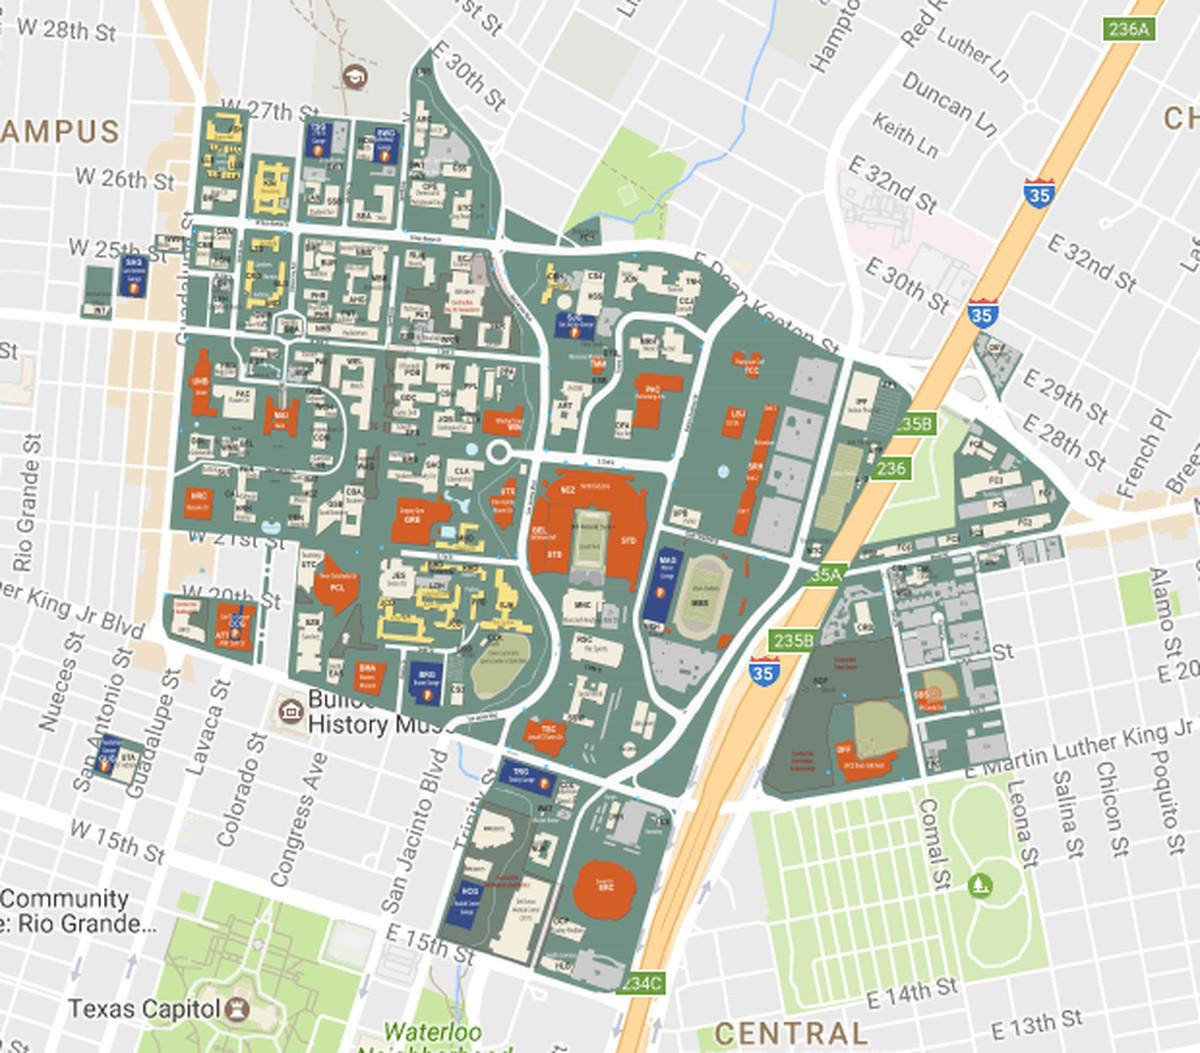 Texas Tech University Campus Map - mandegar.info